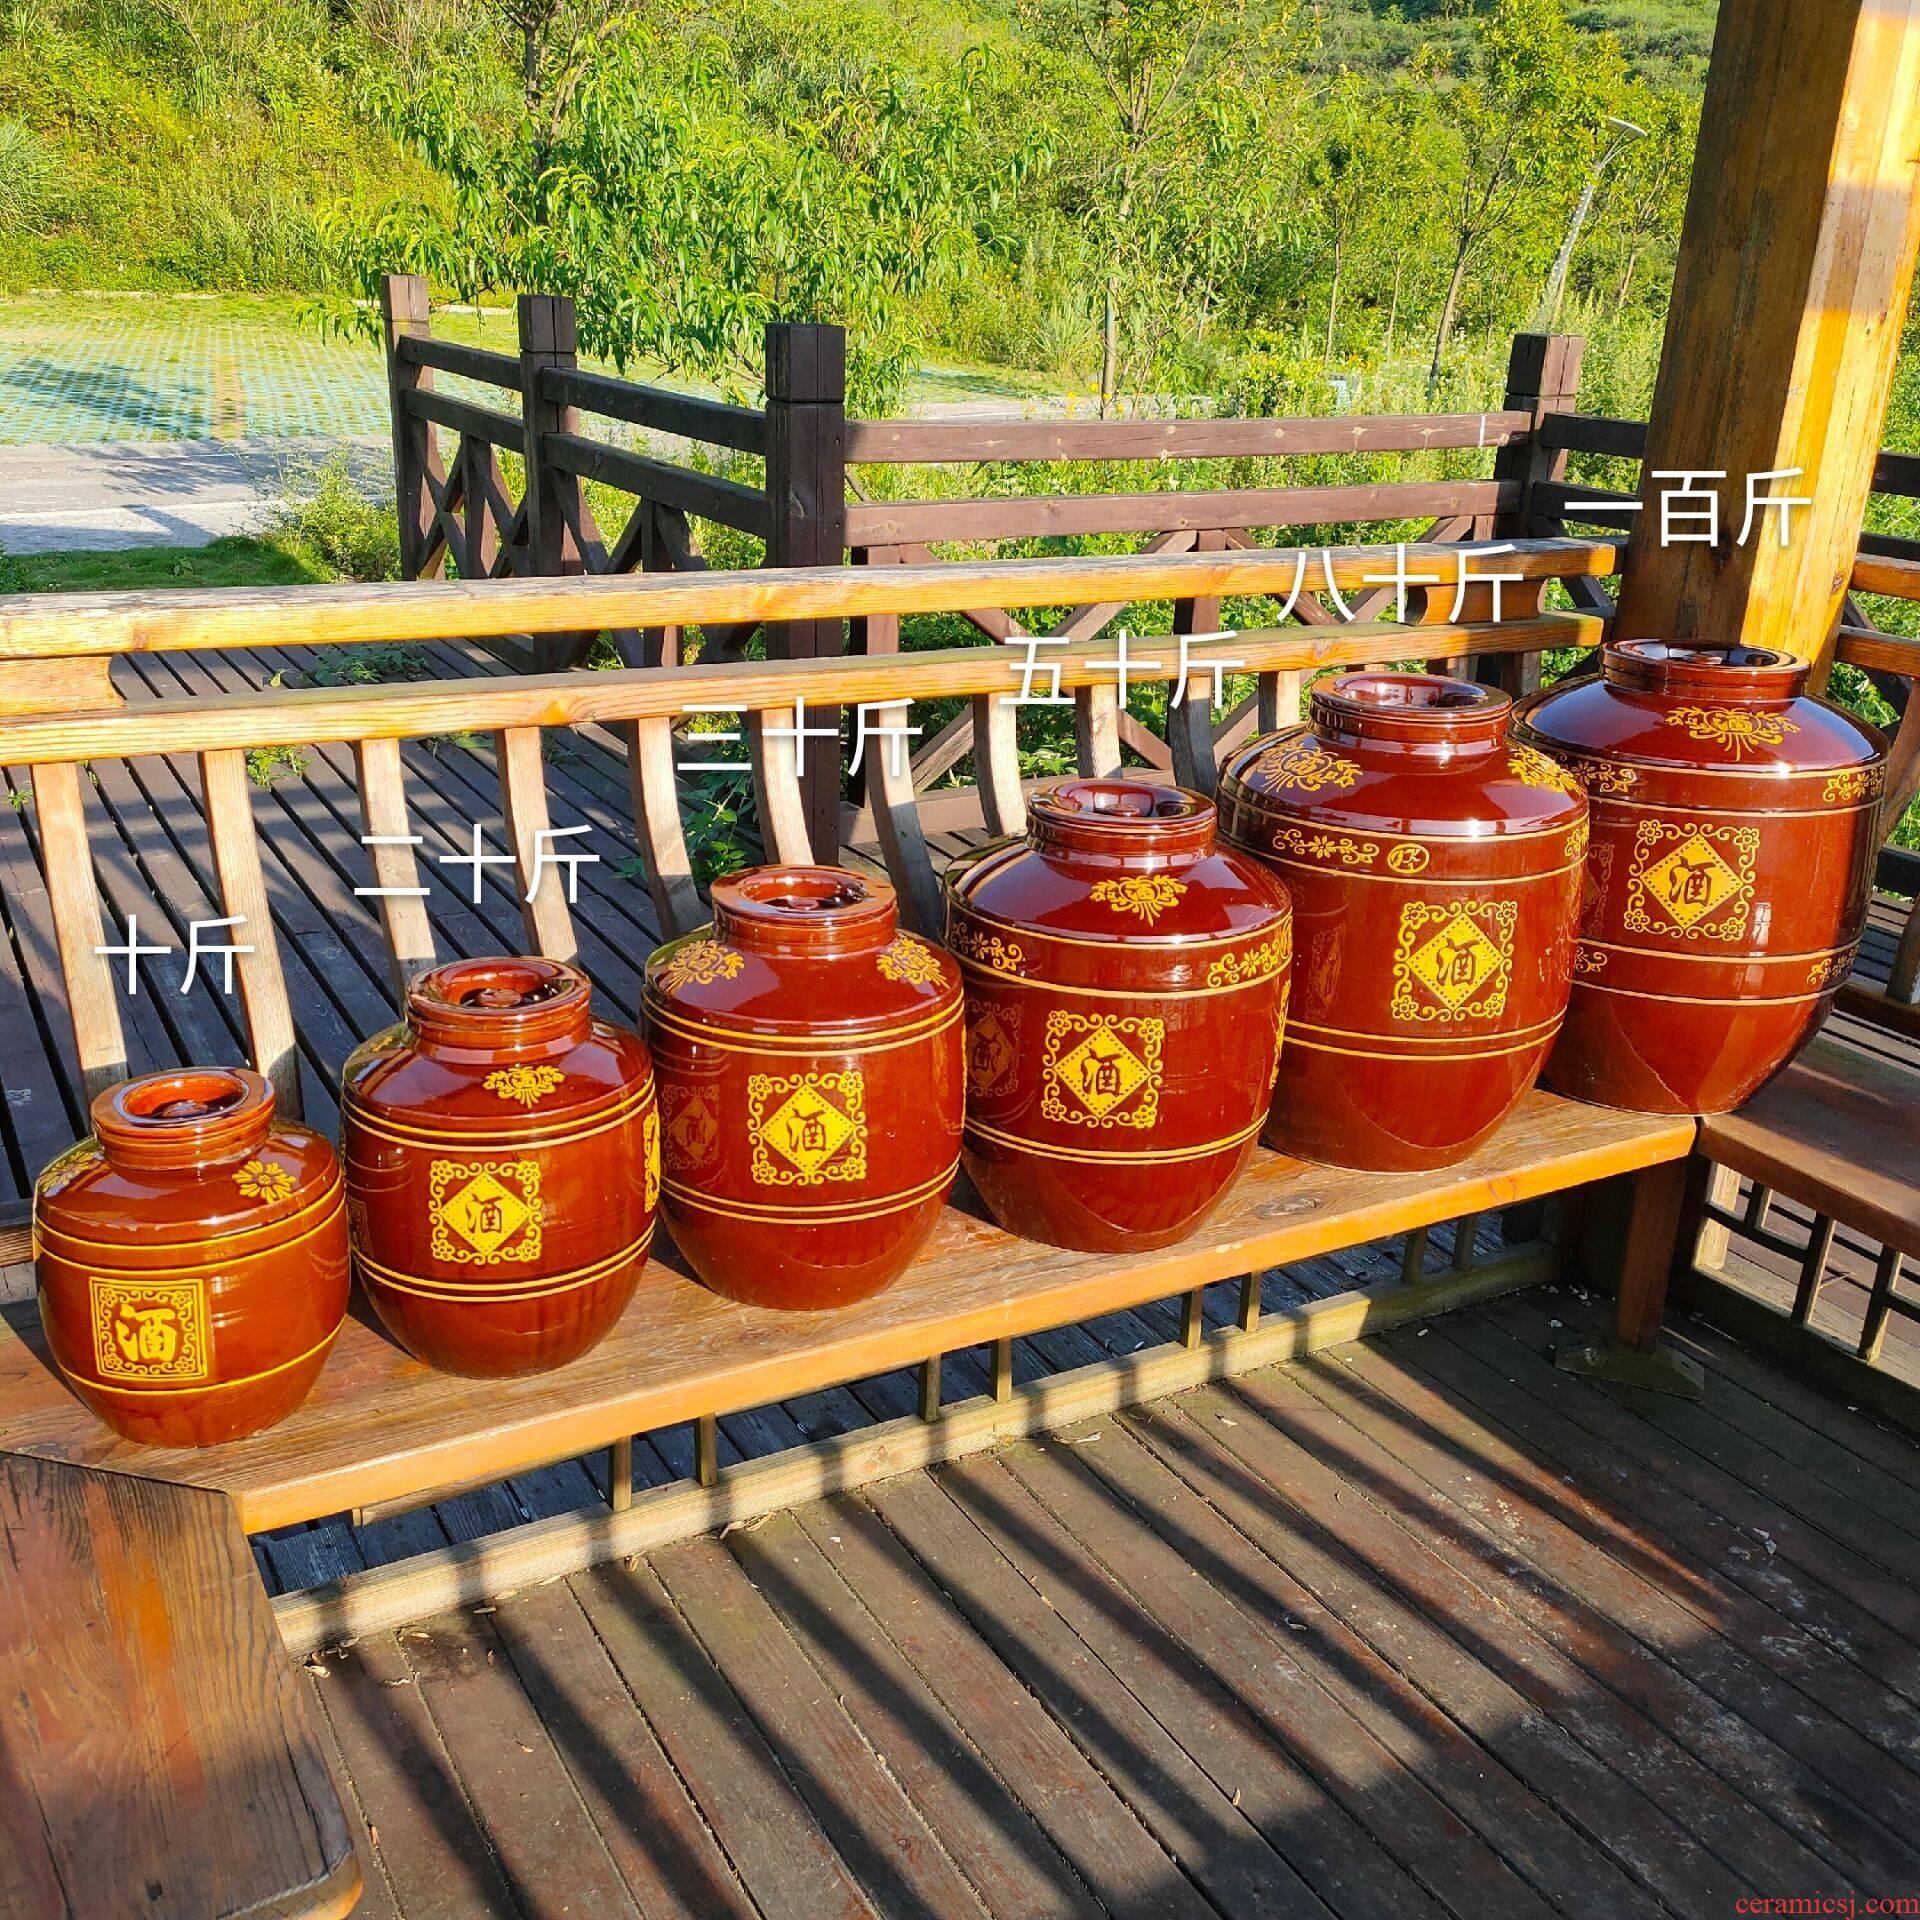 Ceramic jars it great earthenware jar sealing jugs with wine yeast of 10-100 tons of household hoard jars